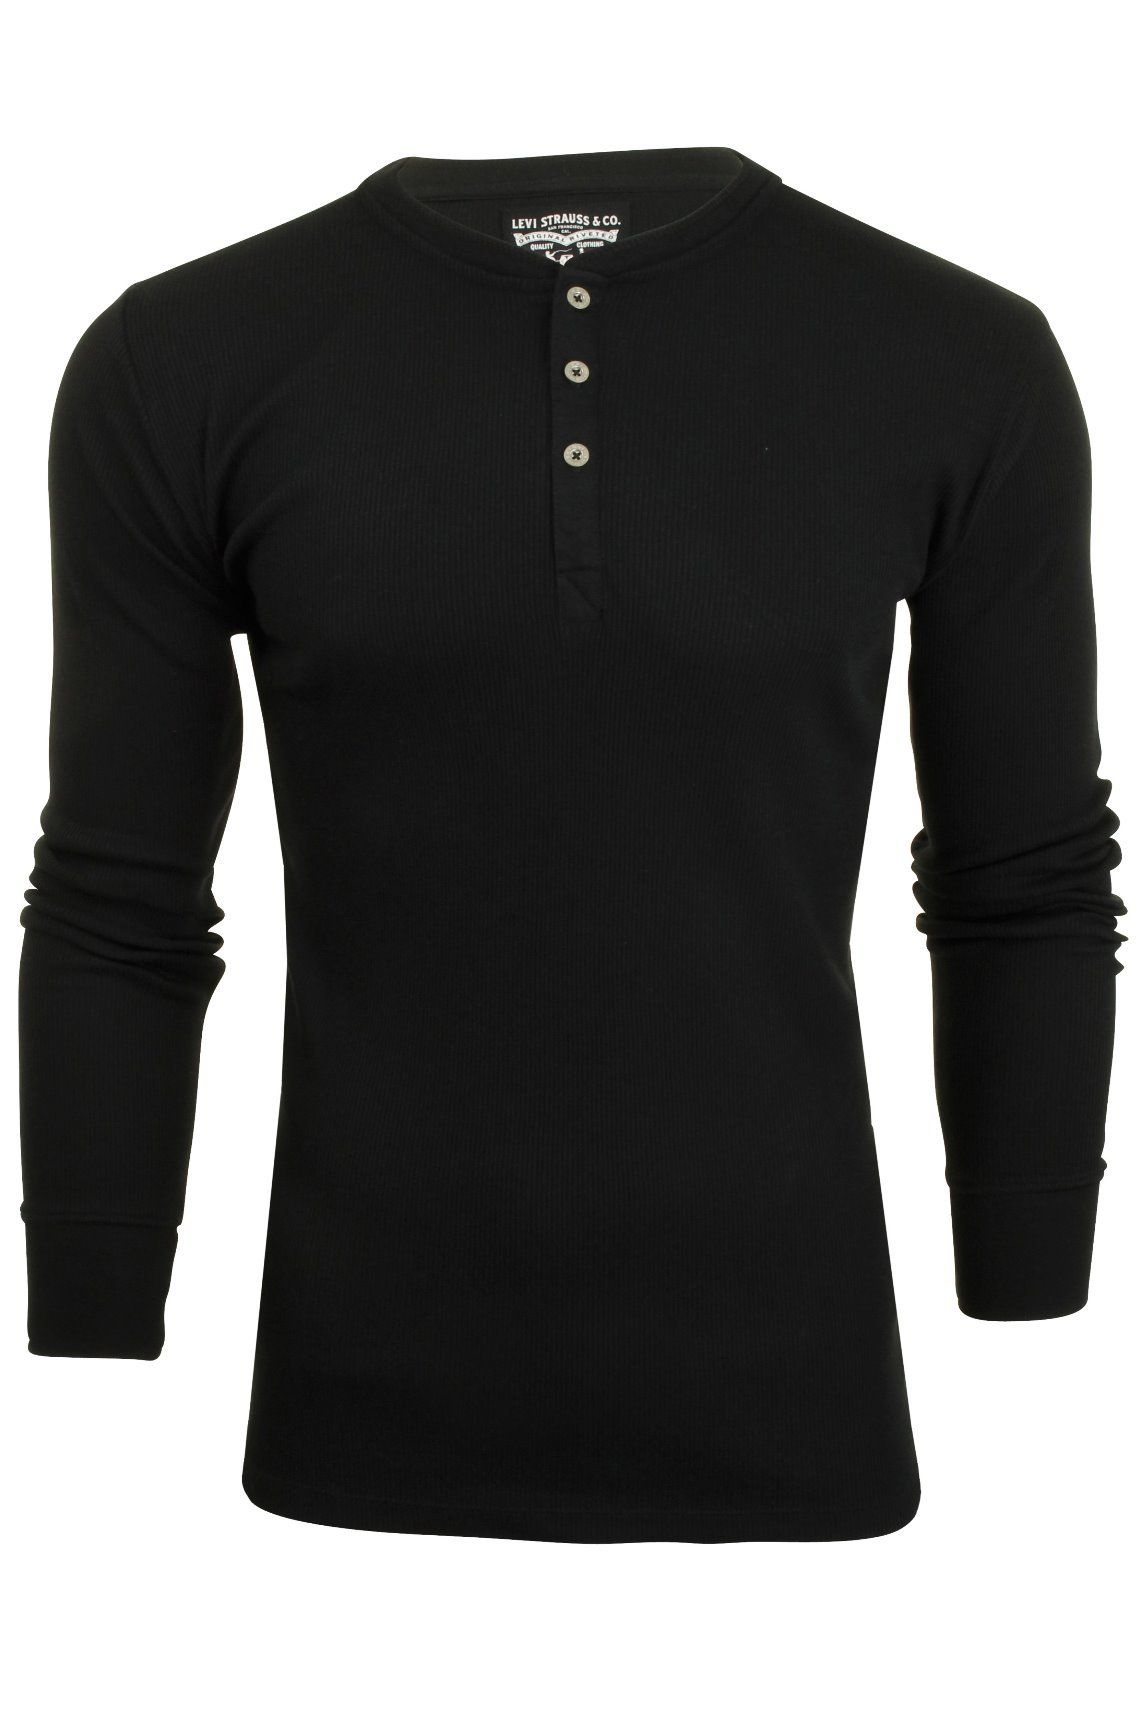 c78ee7463d5 Levi's Mens Grandad '300LS Henley' Rib Long Sleeved T-Shirt | Nomad ...